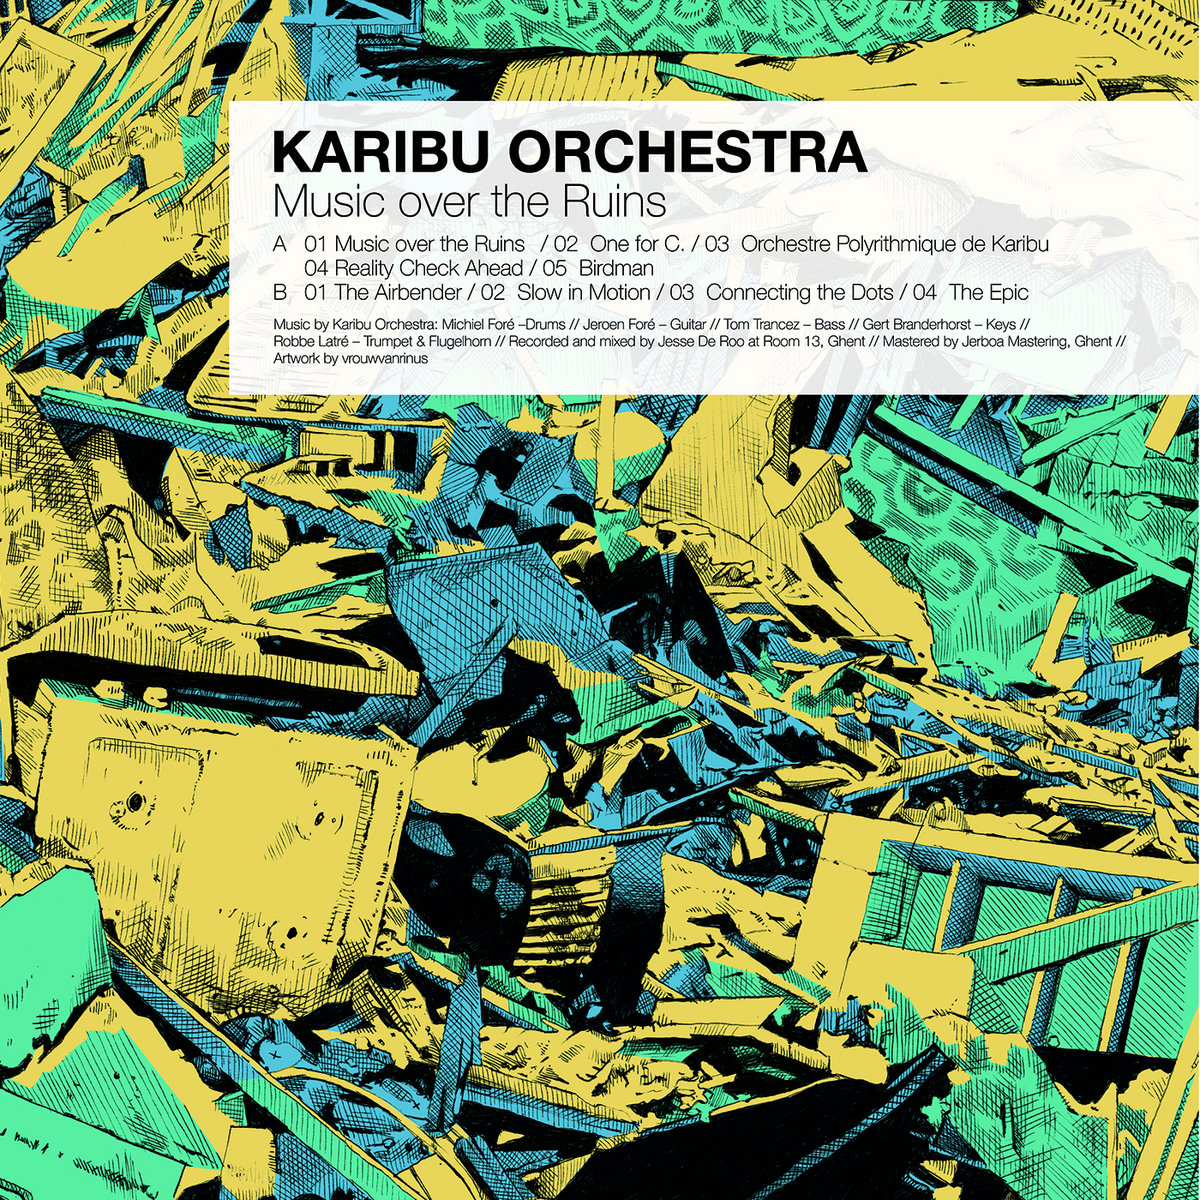 music over the ruins | karibu orchestra